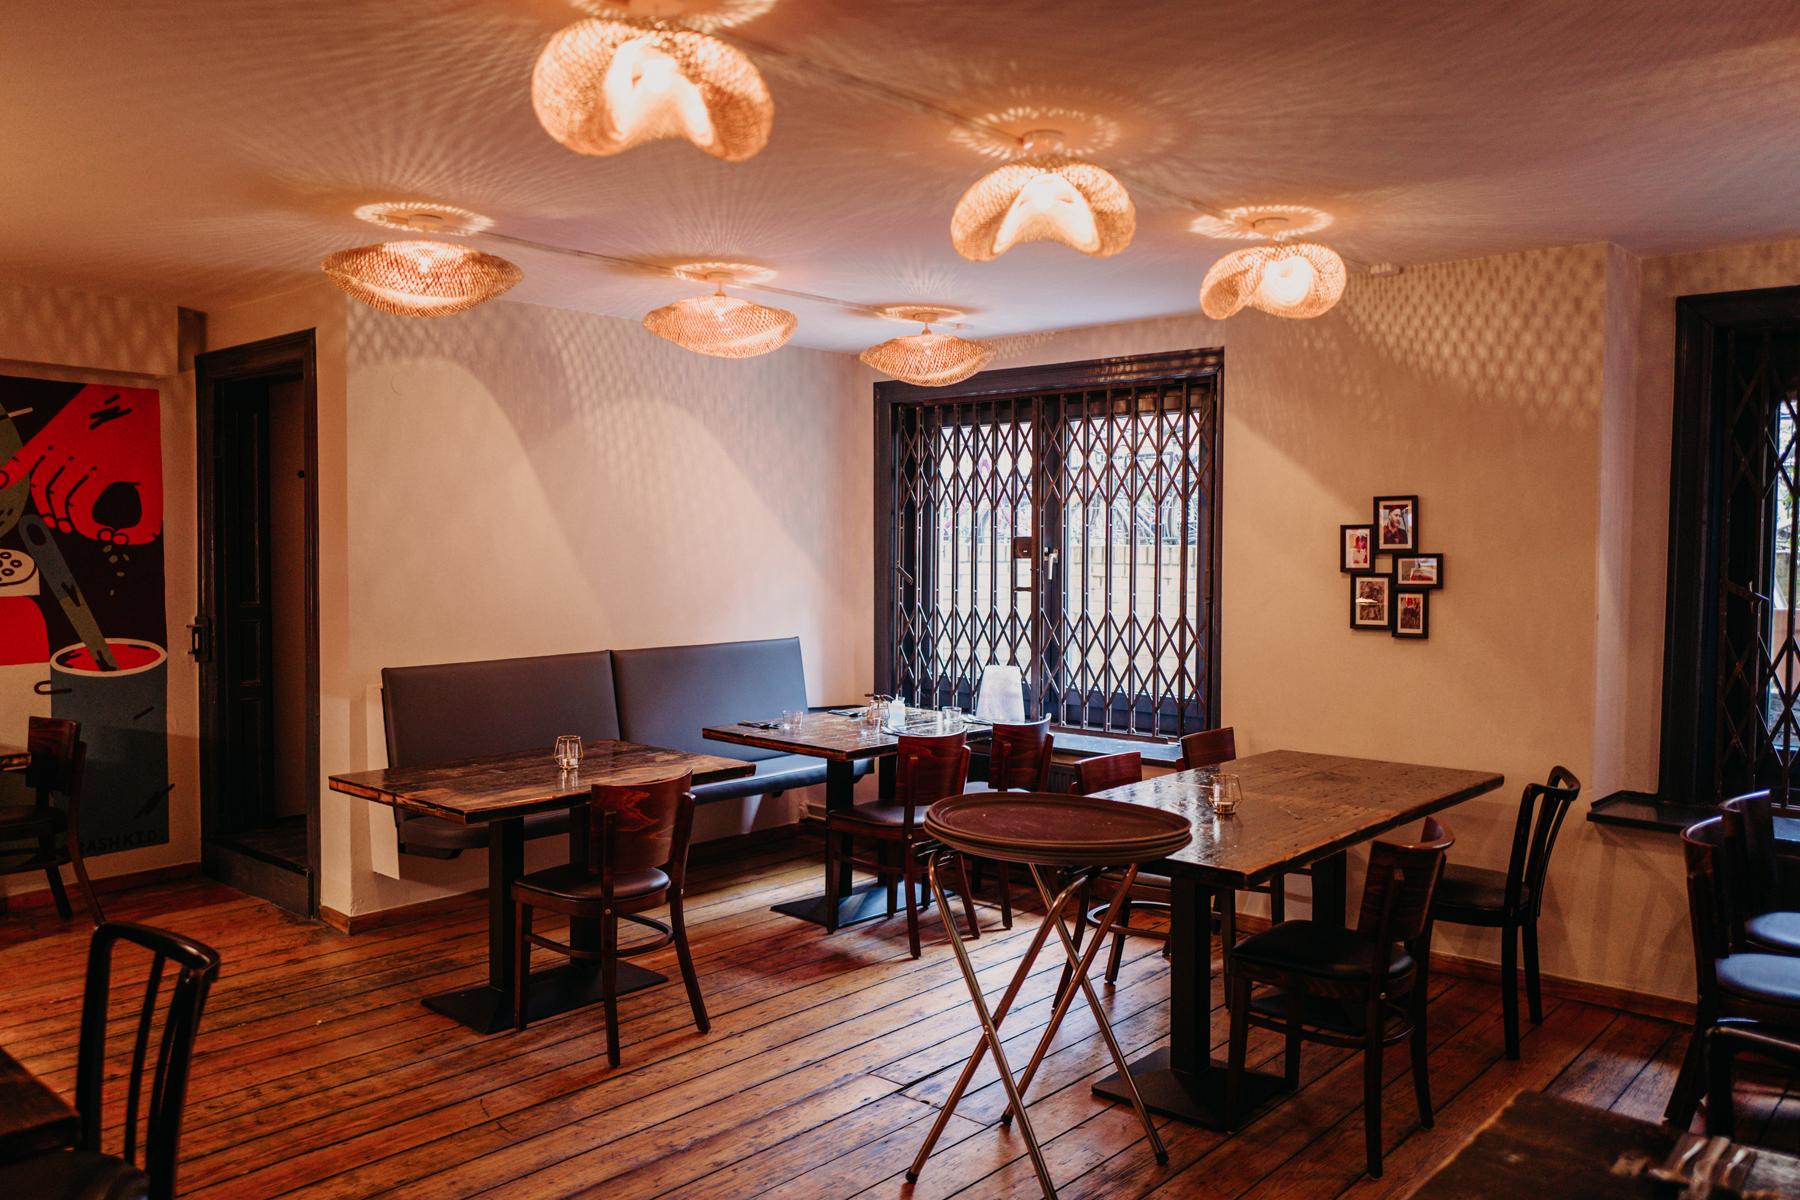 Geheimtipp Hamburg St Pauli Restaurant Maa' Deyo Dahlina Sophie Kock 15